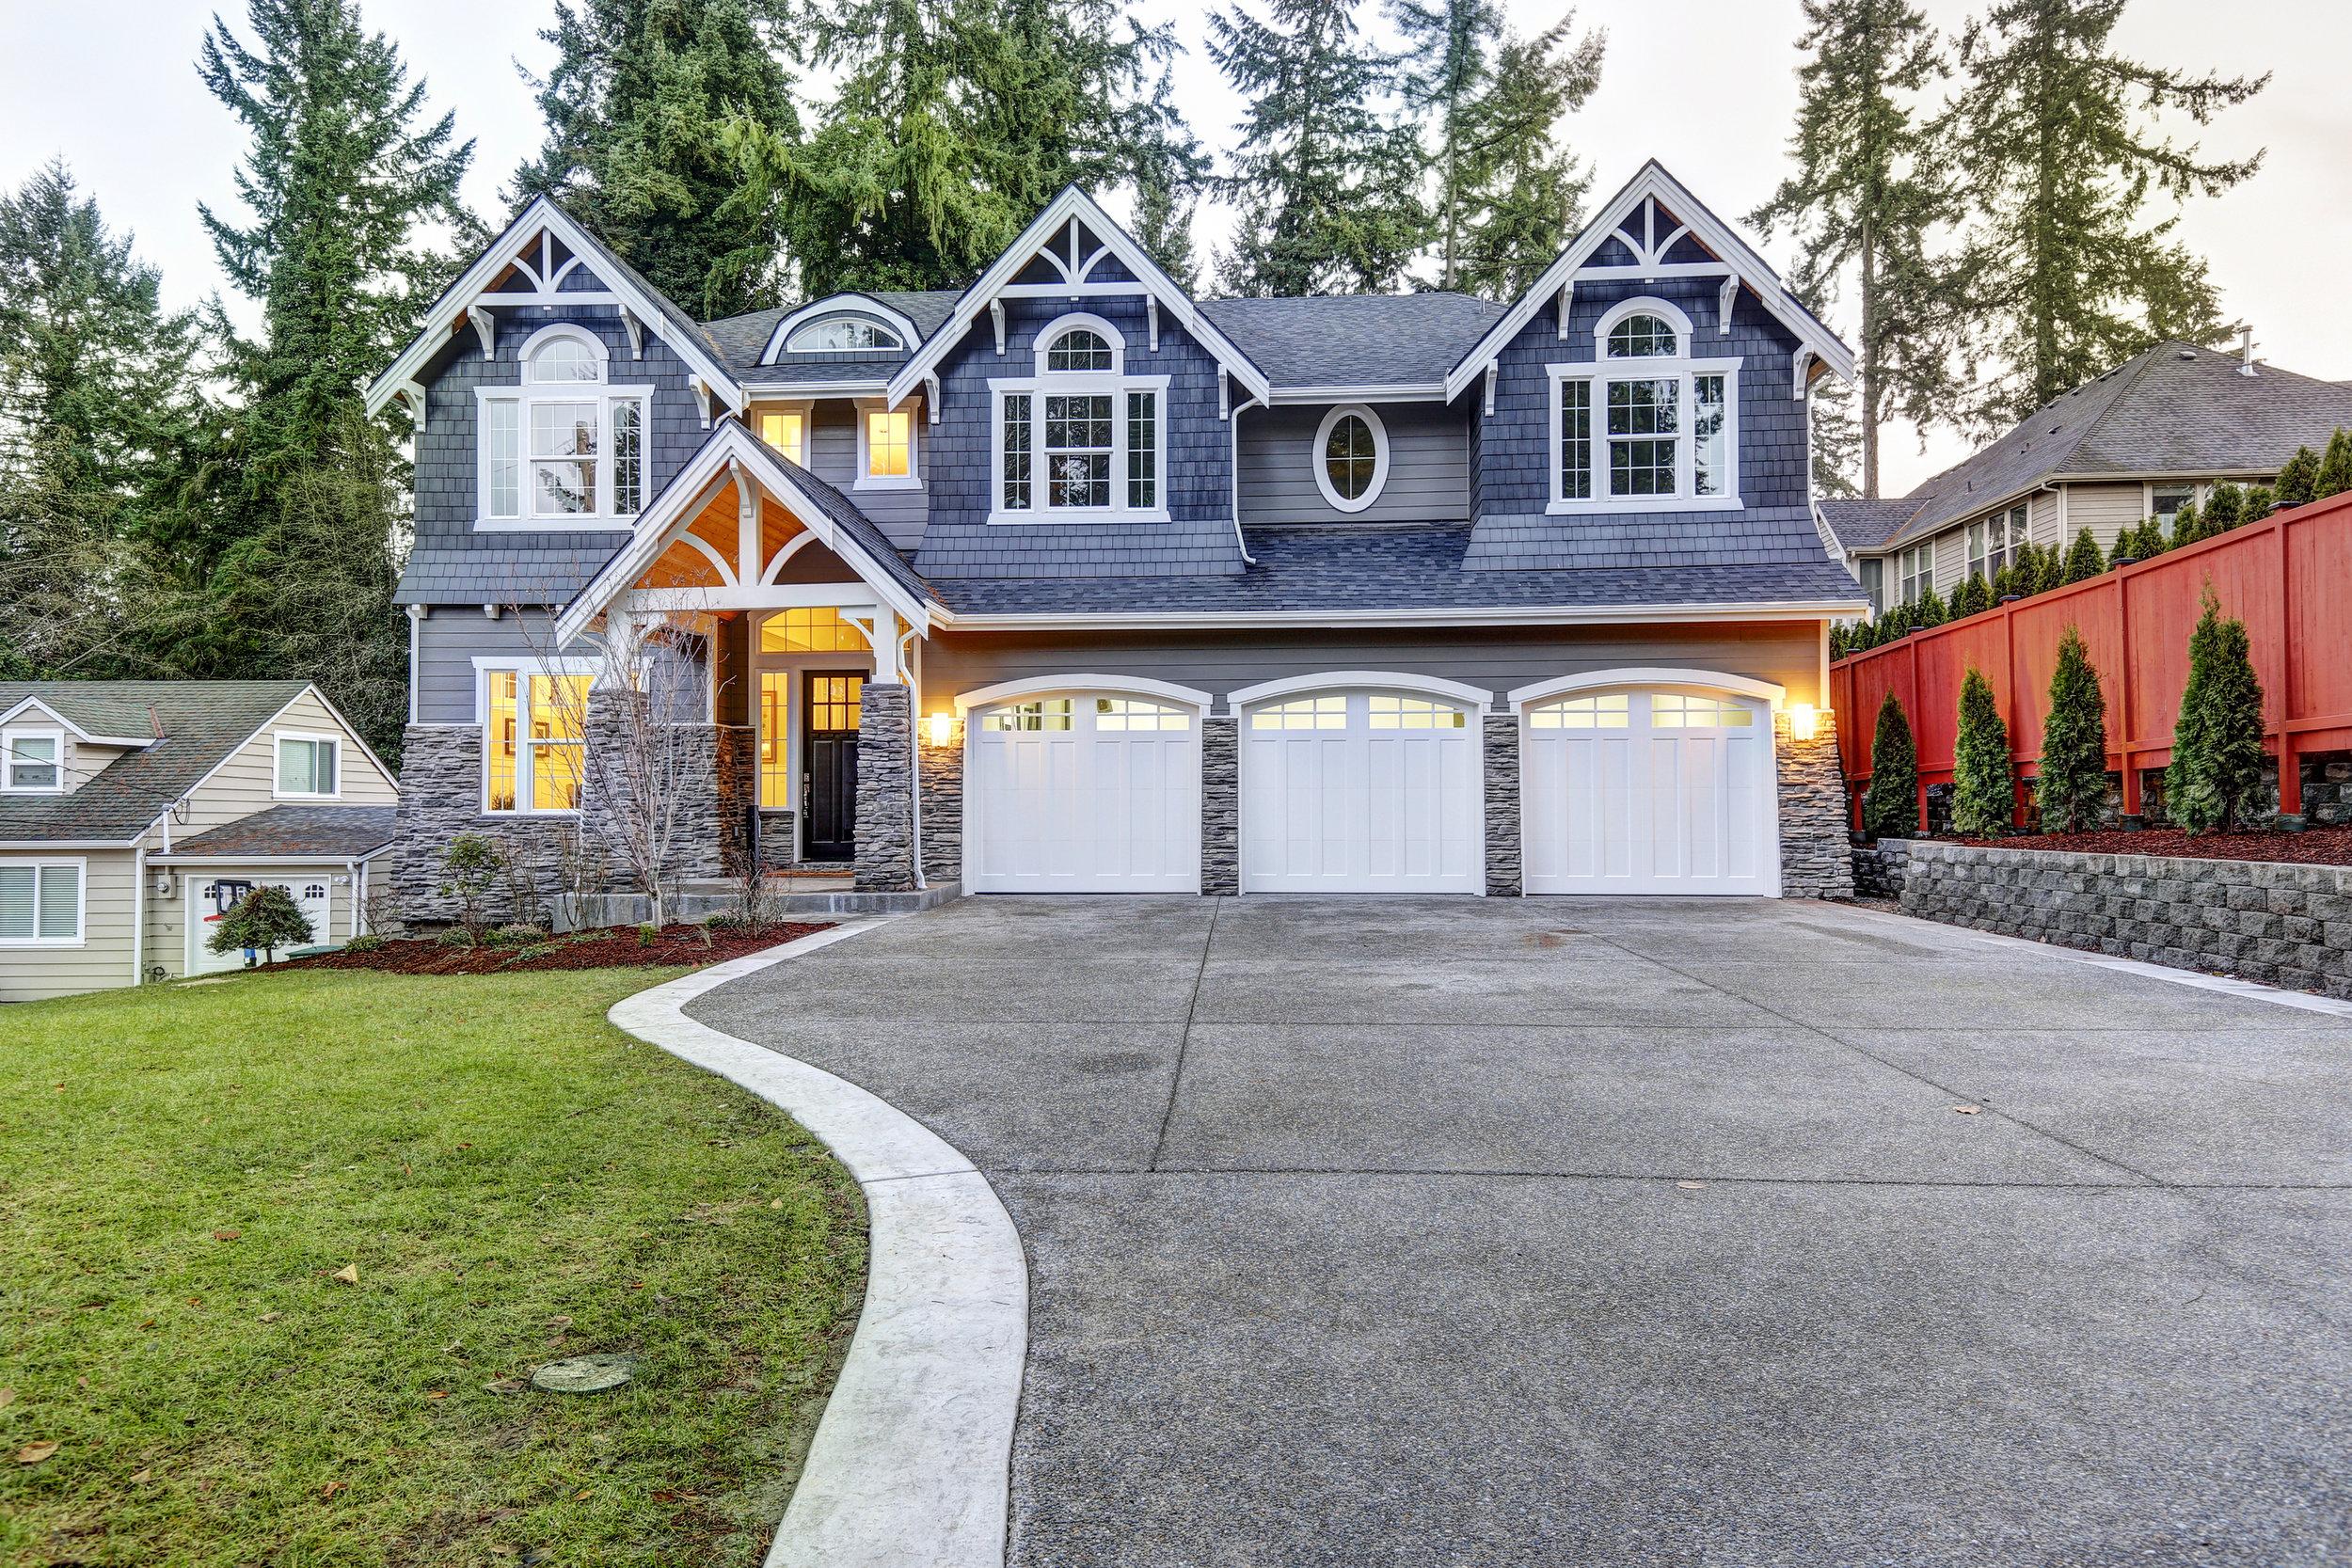 bigstock-Luxurious-Blue-Home-With-Three-212155591.jpg